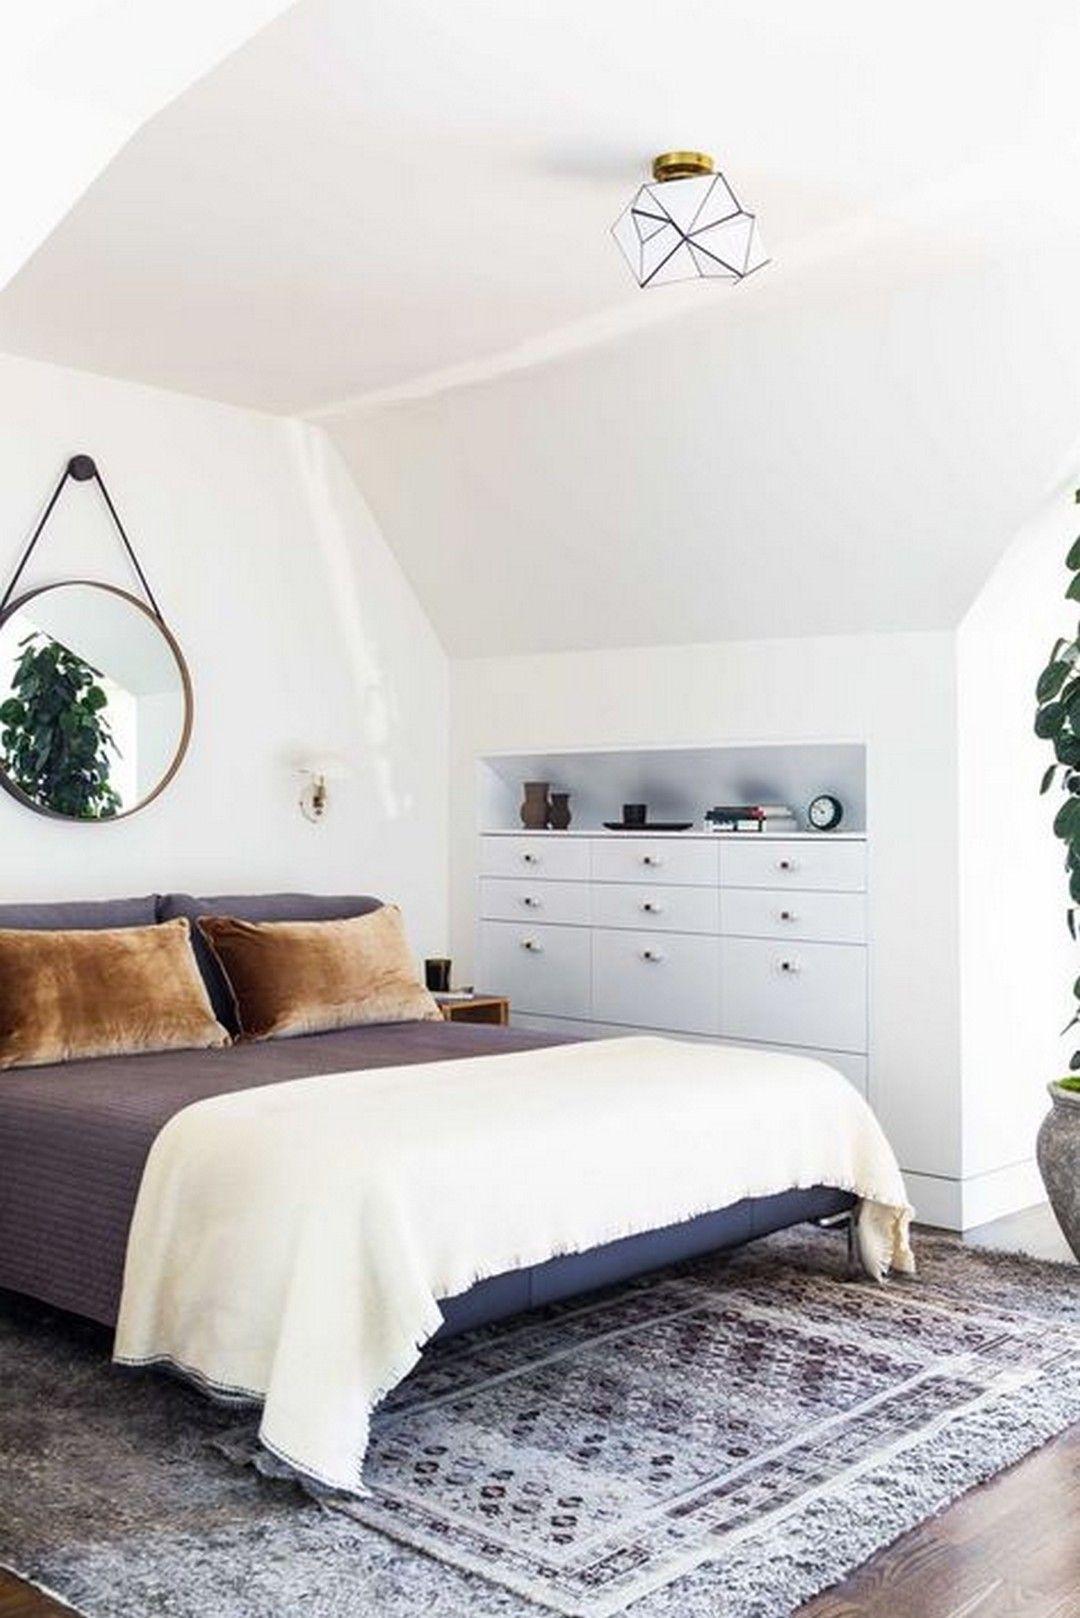 Pin van Whitney DeVoogd op casa | Pinterest - Slaapkamer en Interieur